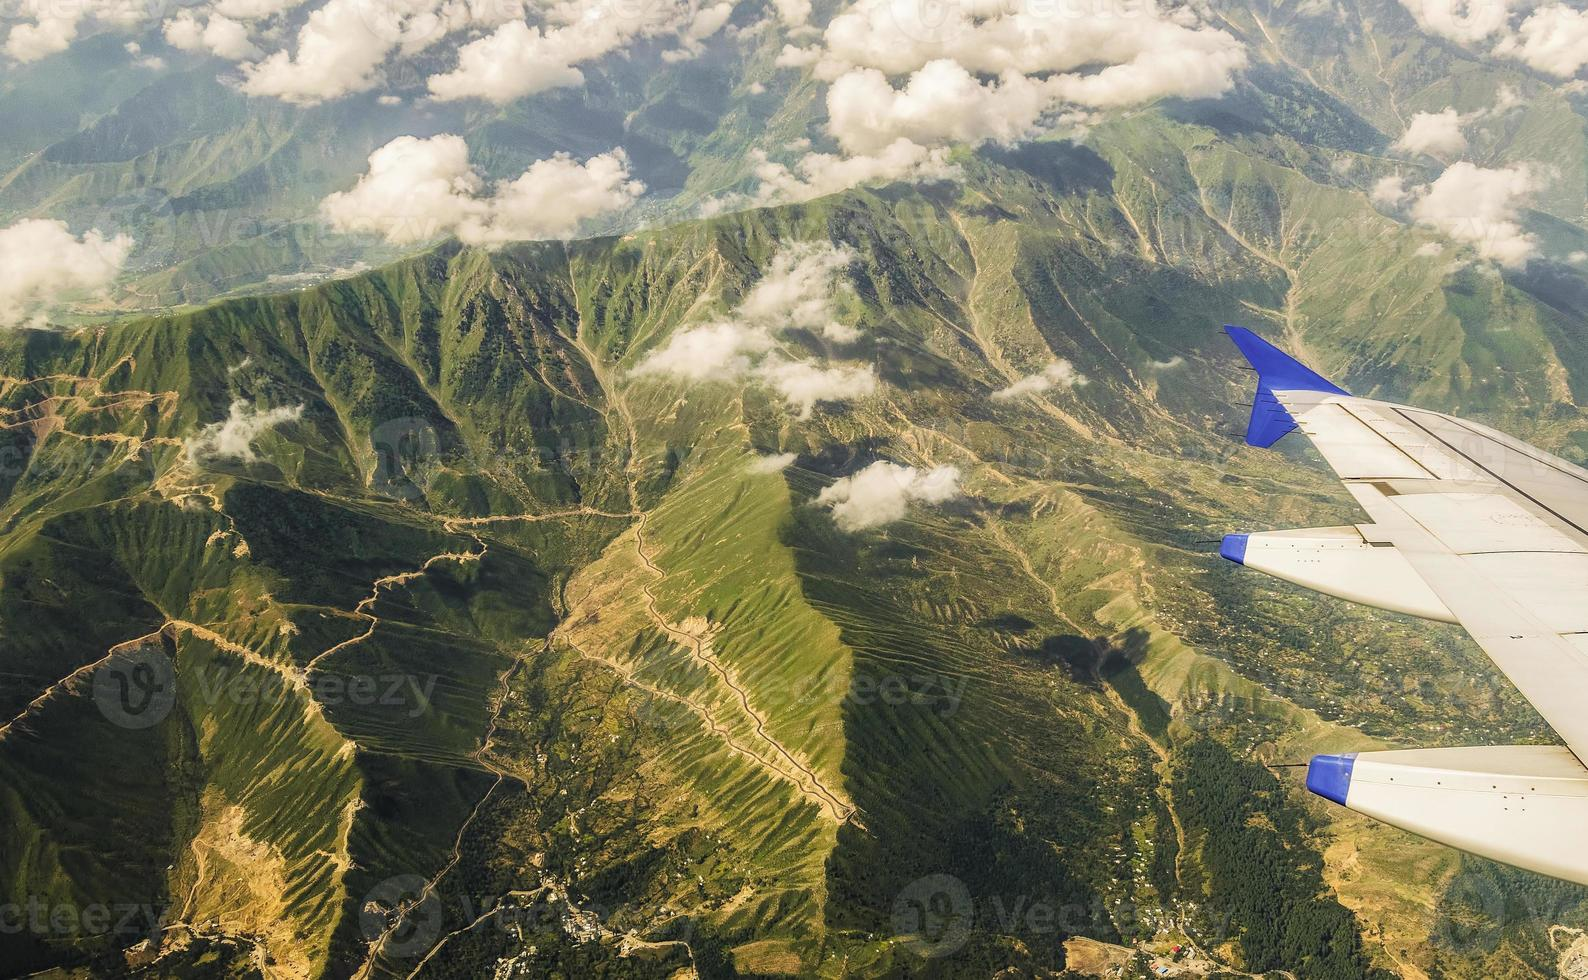 Himalaya luchtfoto vanuit het vliegtuig, Kasjmir, India foto